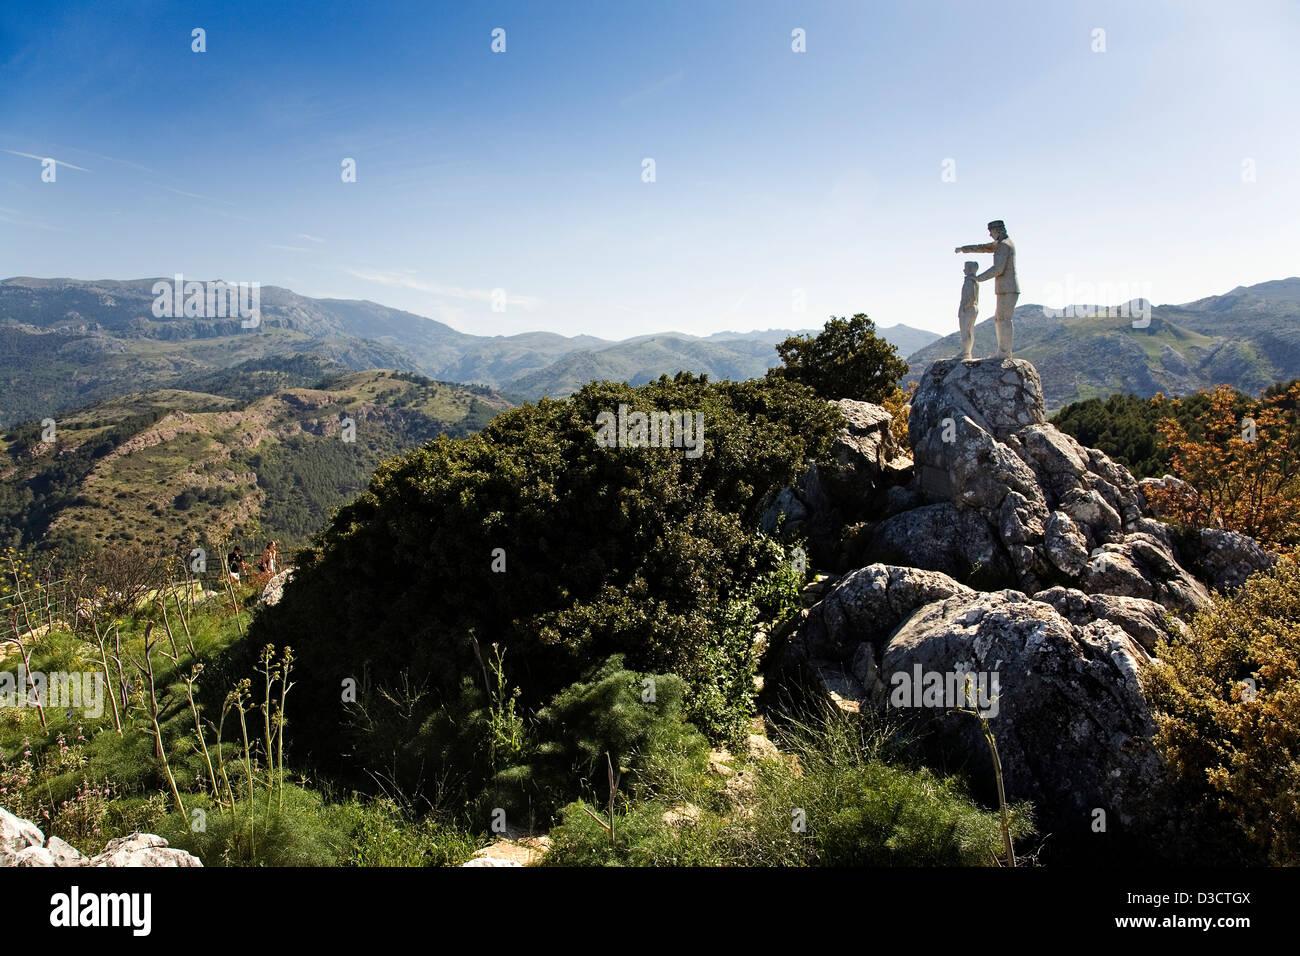 Memorial Forest Guard Serrania de Ronda Malaga Andalusia Spain - Stock Image